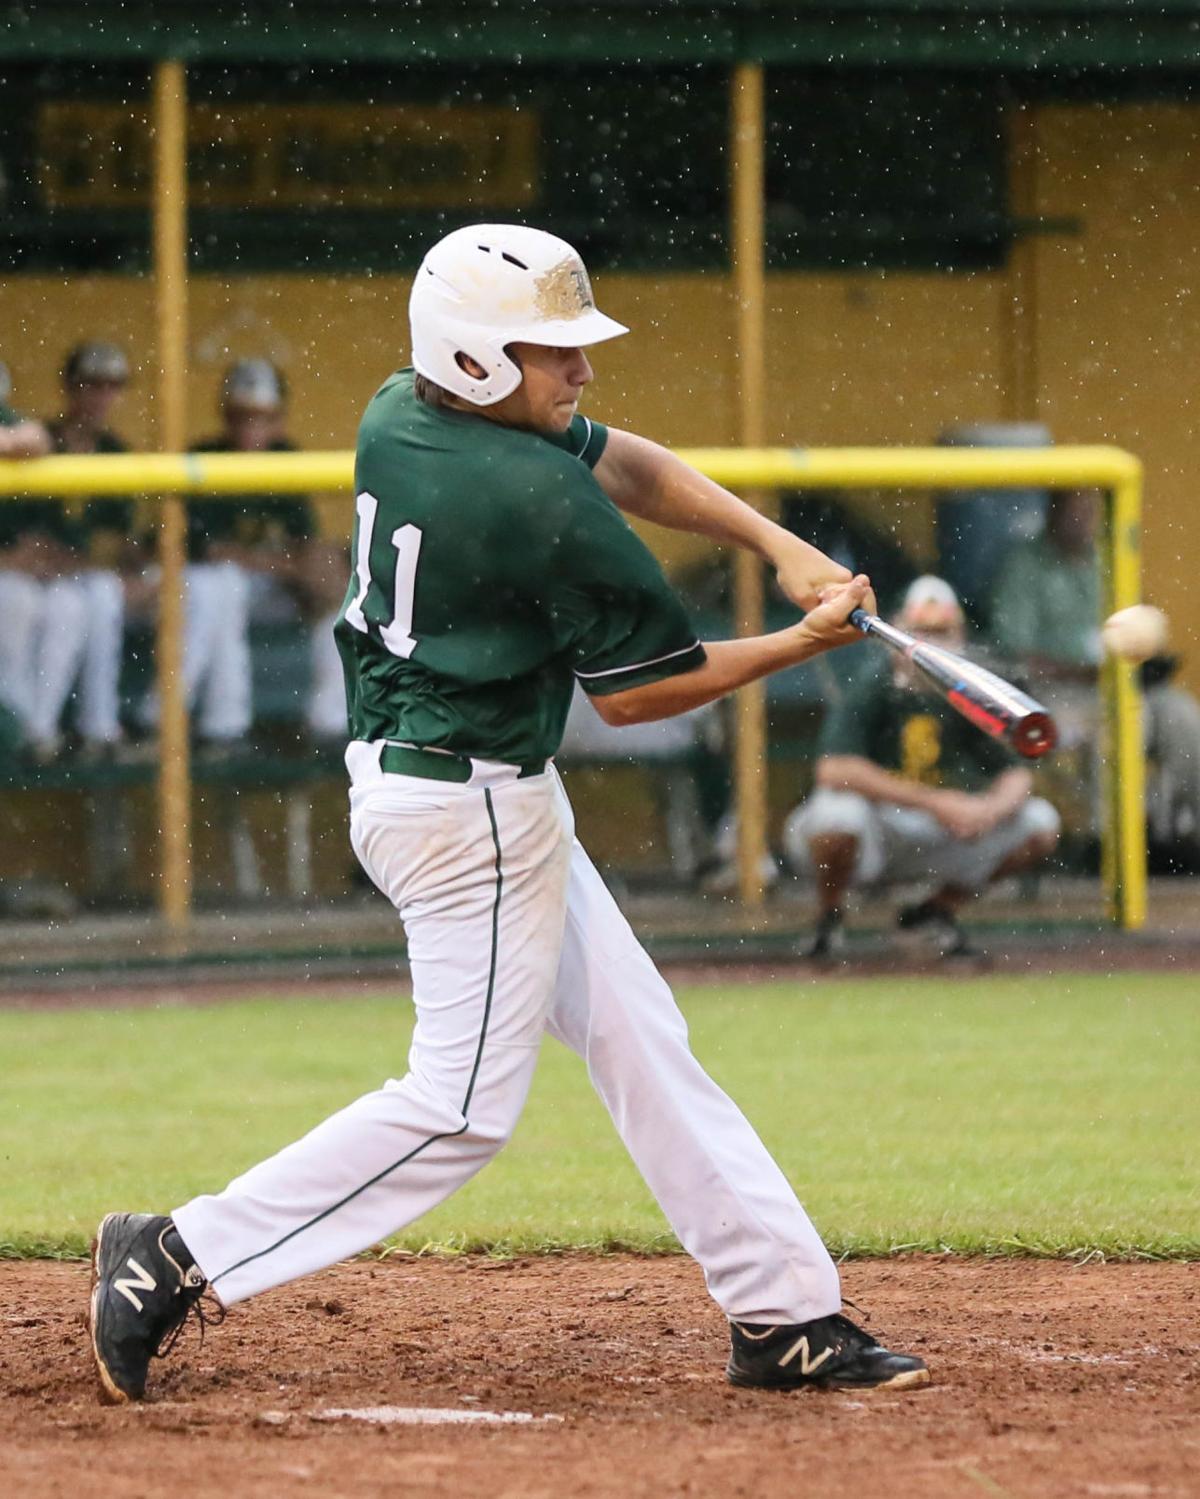 FSHS-Maurepas baseball Chase Guitreau